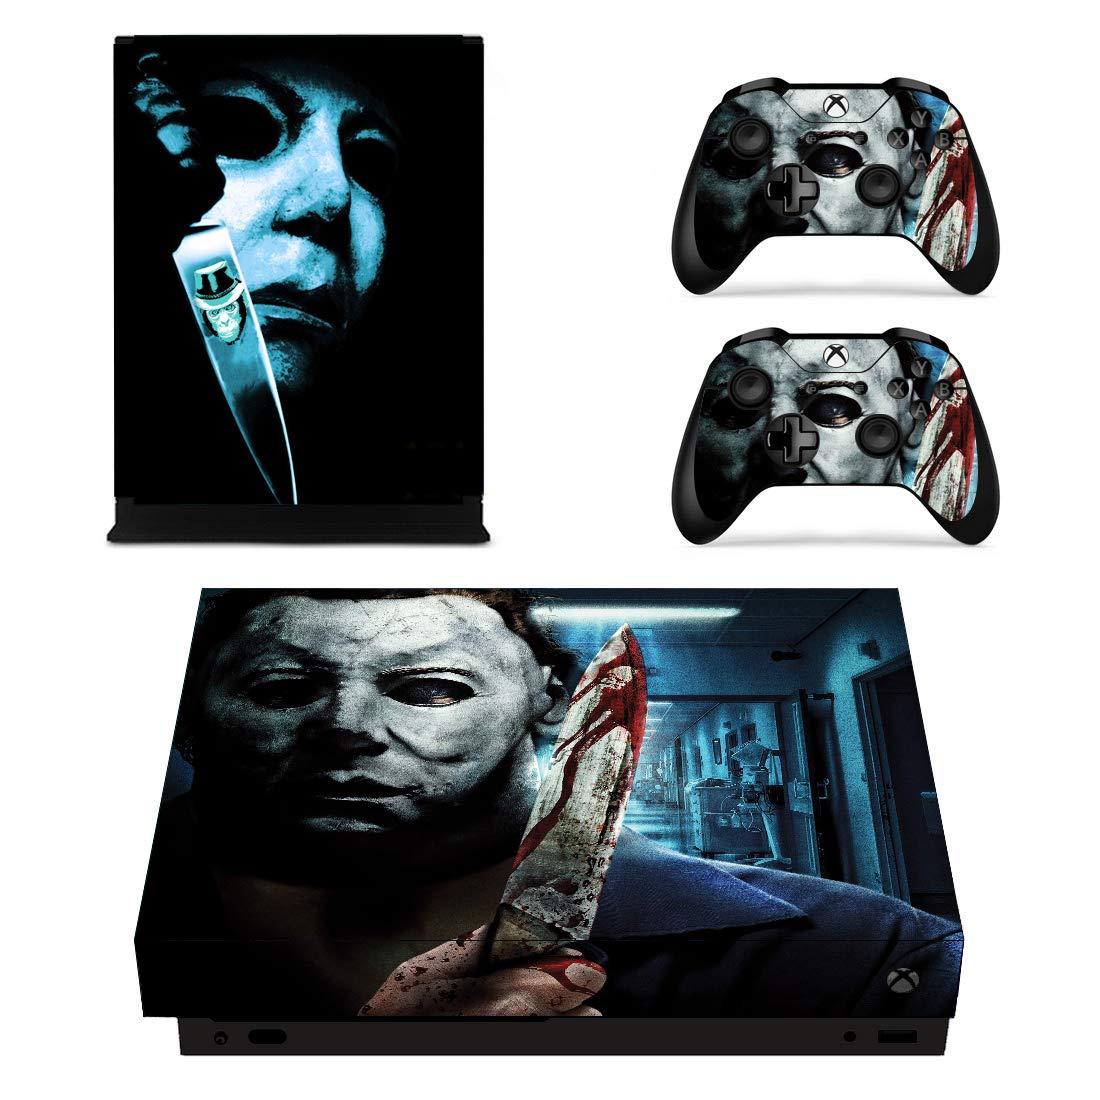 Xbox One X Camo 4 Skin Sticker Console Decal Vinyl Xbox Controller Video Game Accessories